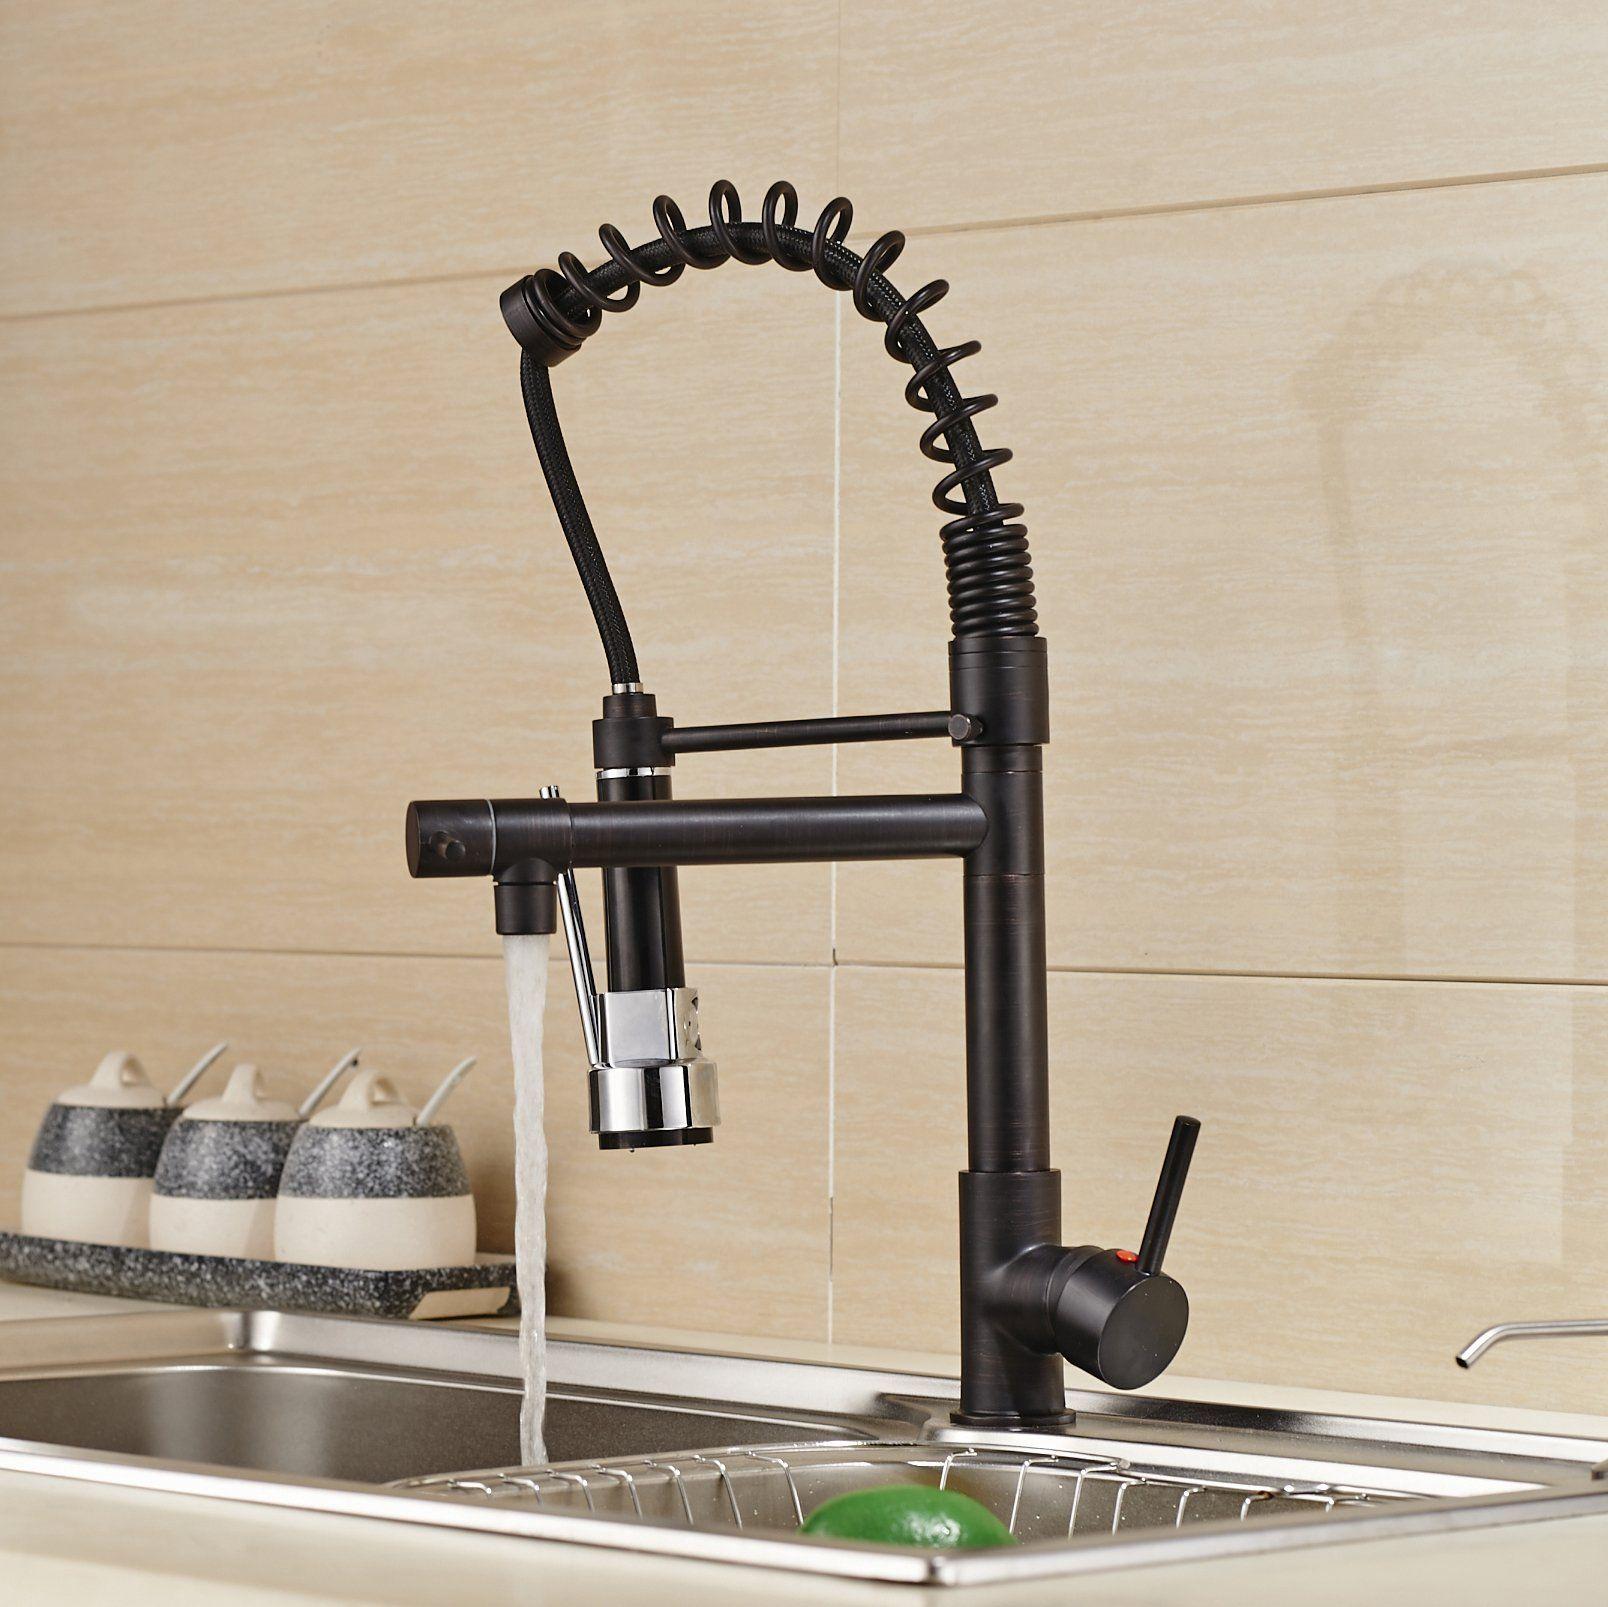 Rozin Oil Rubbed Bronze Pull Down Spray Kitchen Sink Faucet Swivel Spout Mixer Tap Amazon Com Kitchen Sink Faucets Faucet Bronze Kitchen Faucet